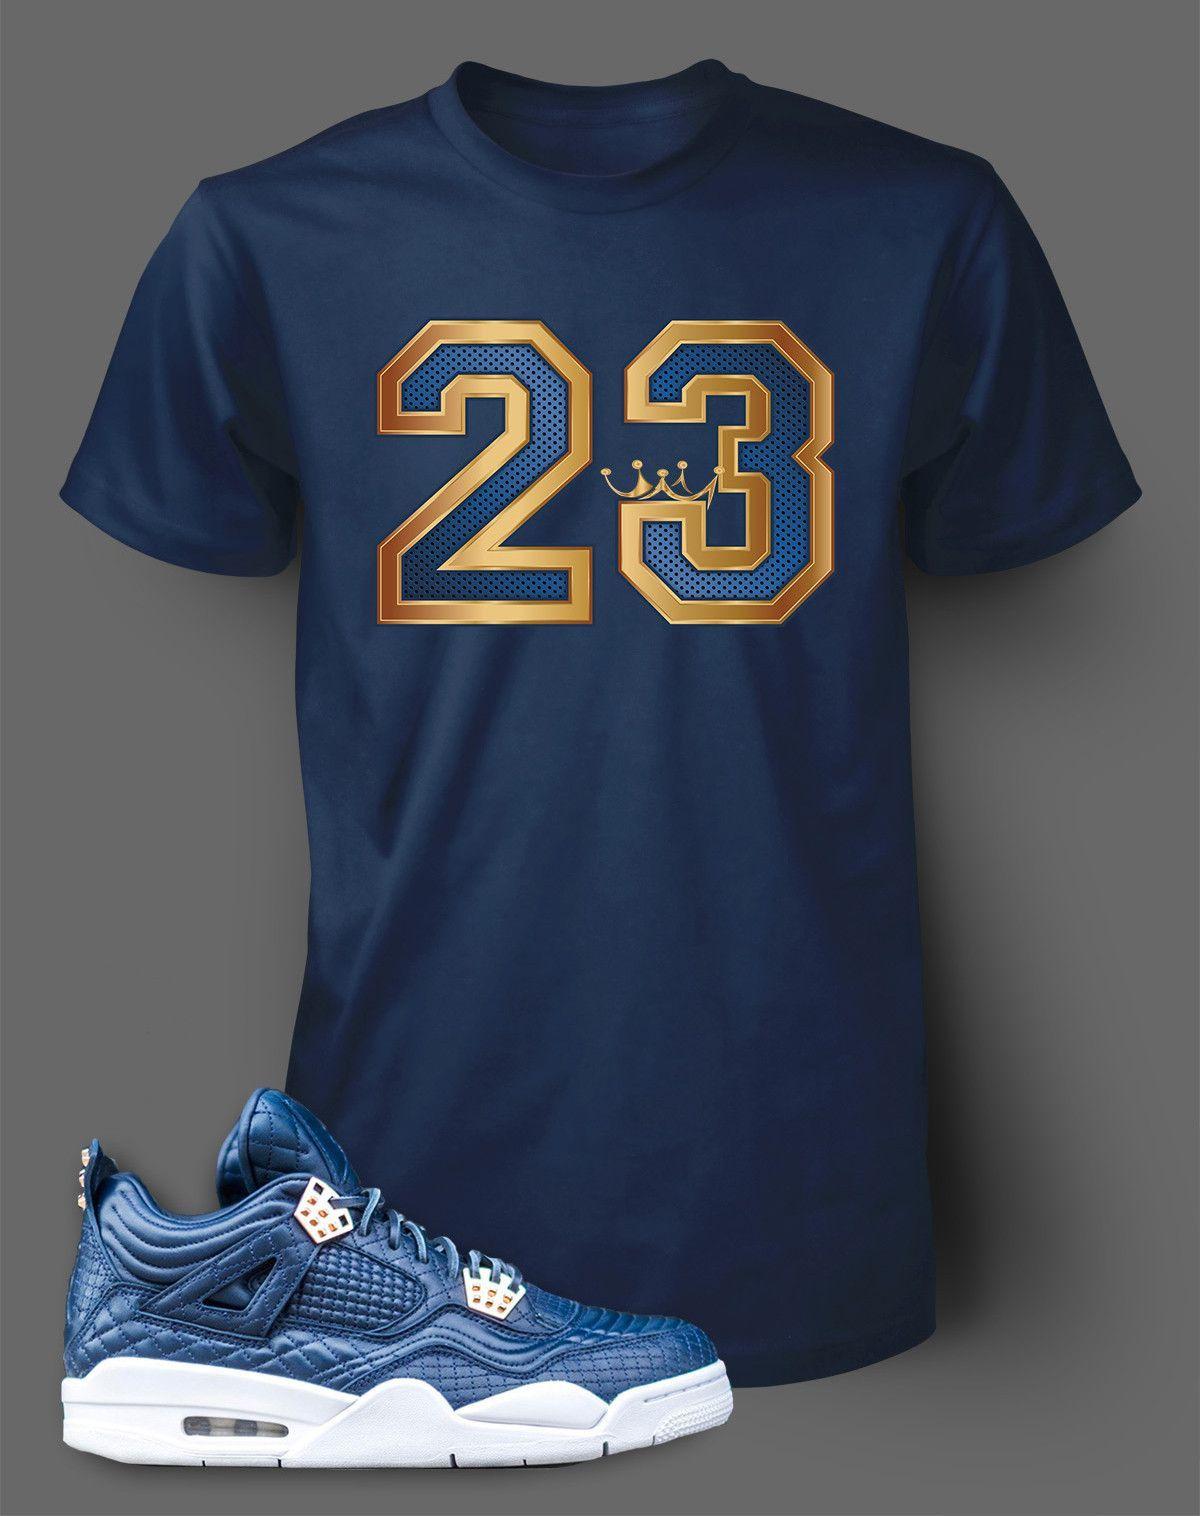 f34a287dacc081 ... T-Shirts 15687 Shirt To Match Air Jordan Retro 5 Blue Suede Sneakers.